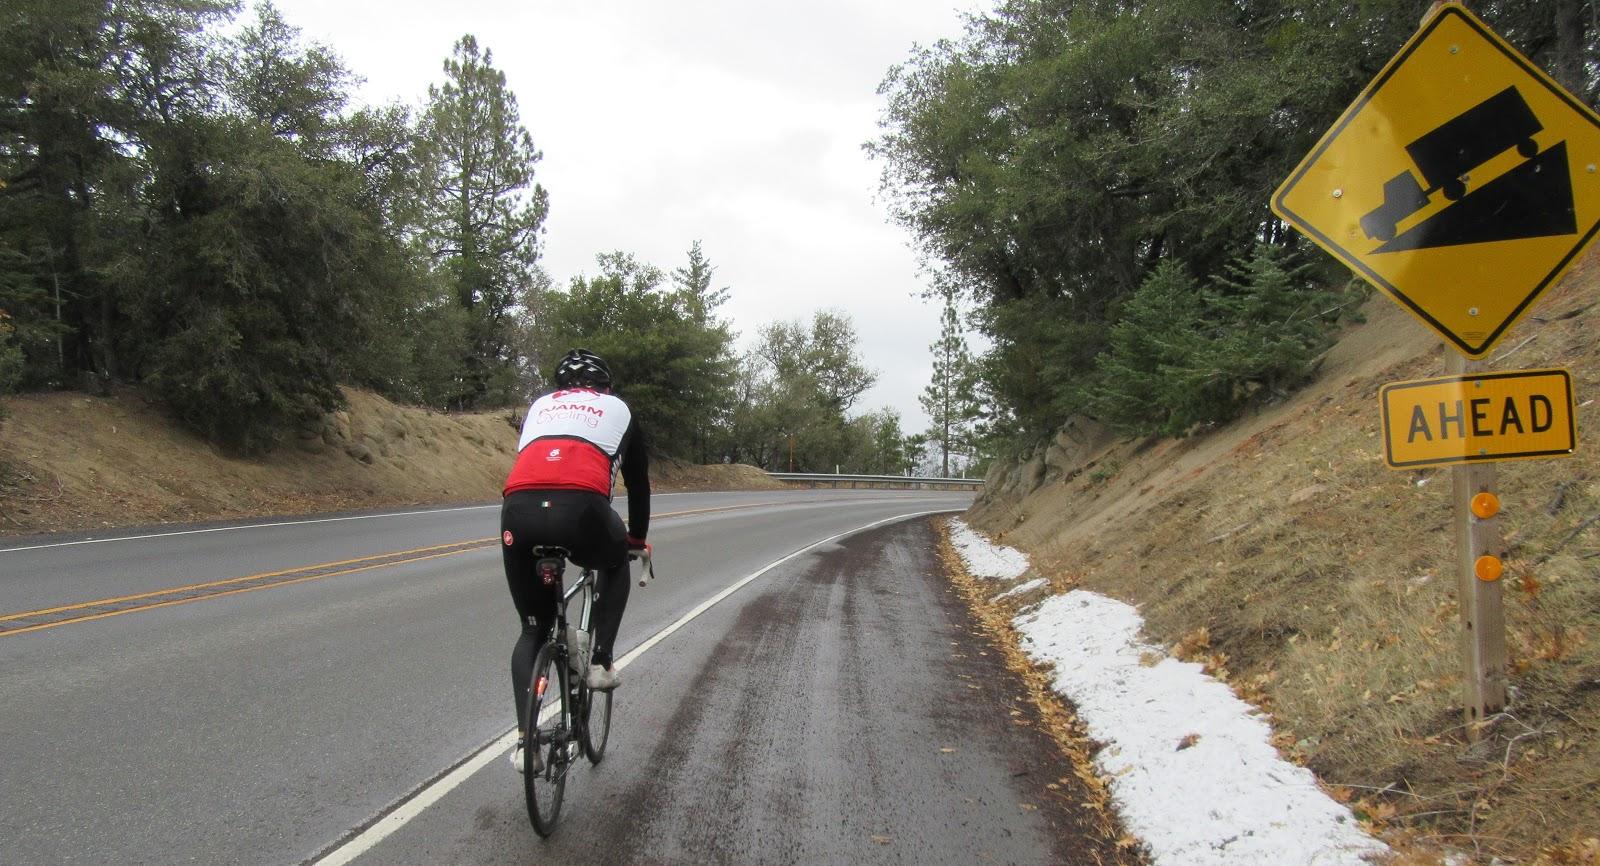 Climbing Onyx Summit by bike - cyclist on bike with steep grade sign.